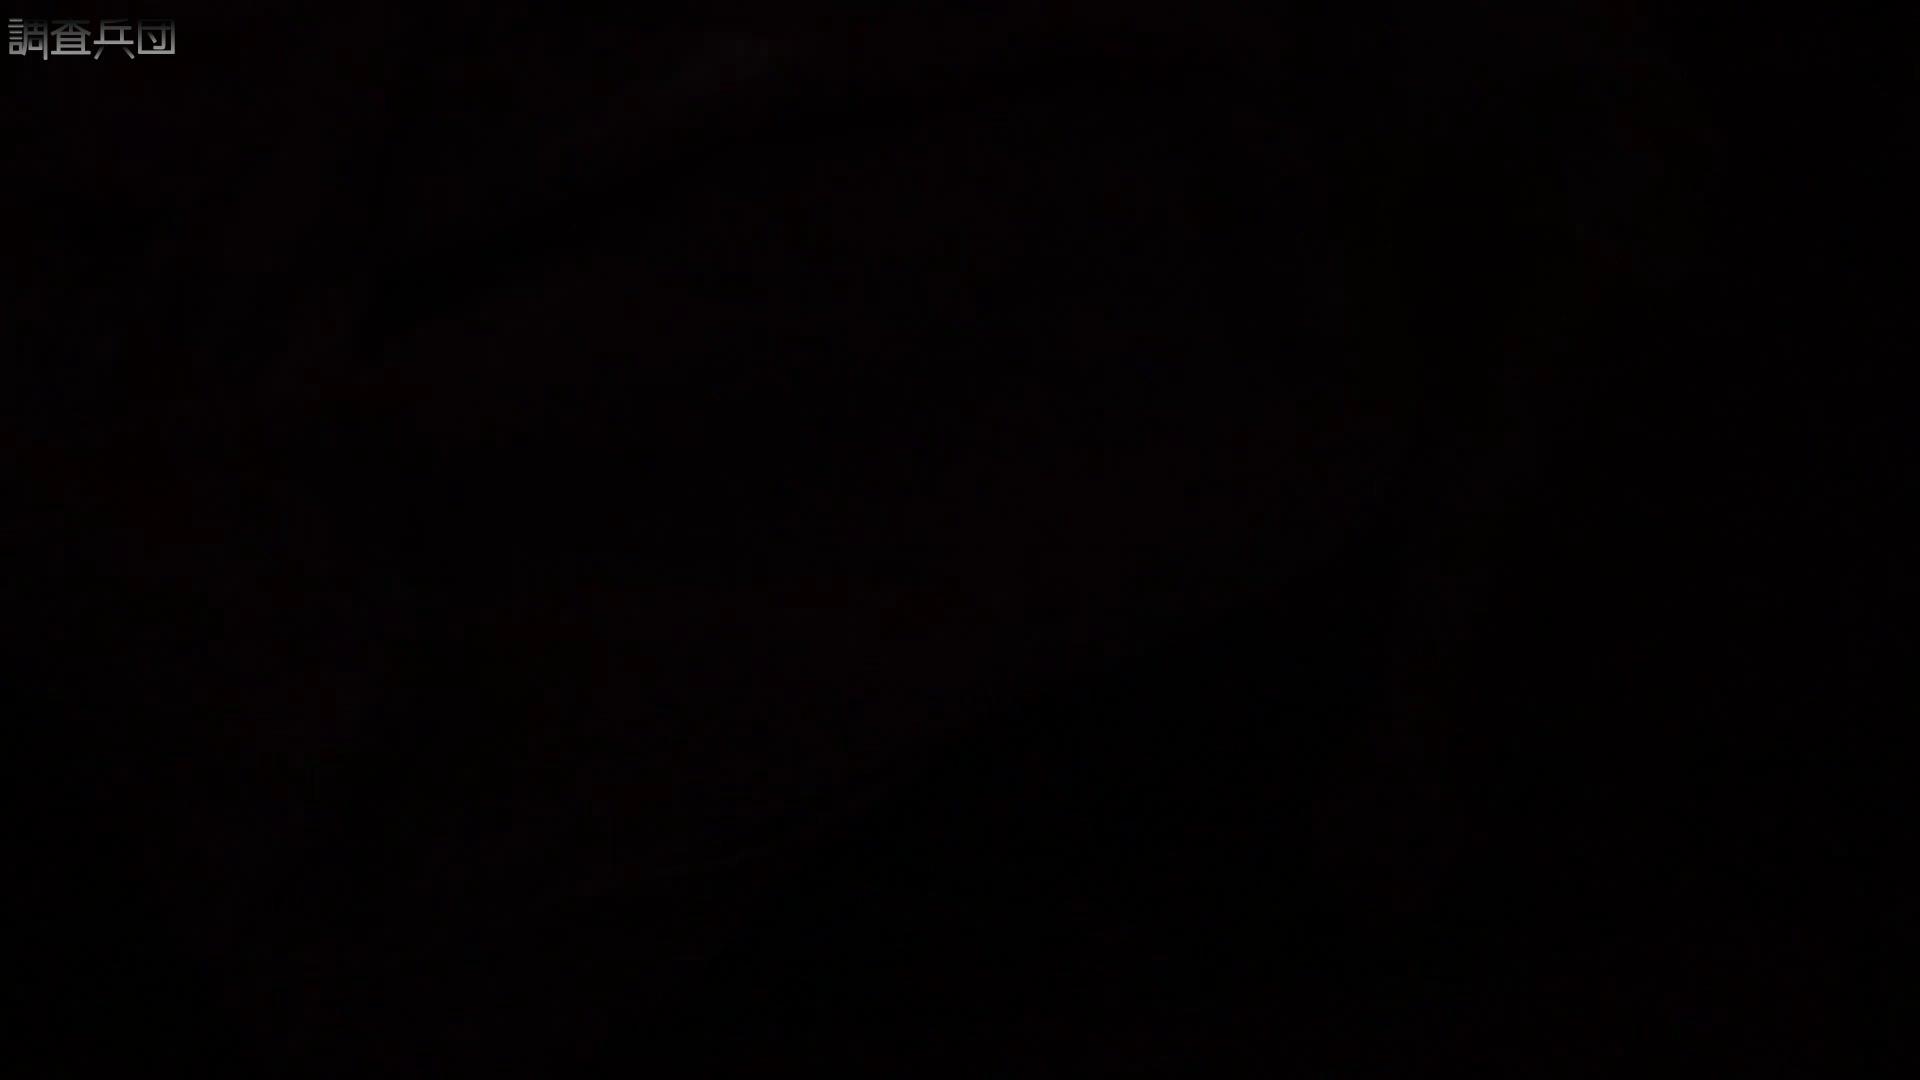 RE:~反撃の悪戯~vol.24 危険で淫靡な香りのする・まりりん【後編】 ギャル  51PIX 11